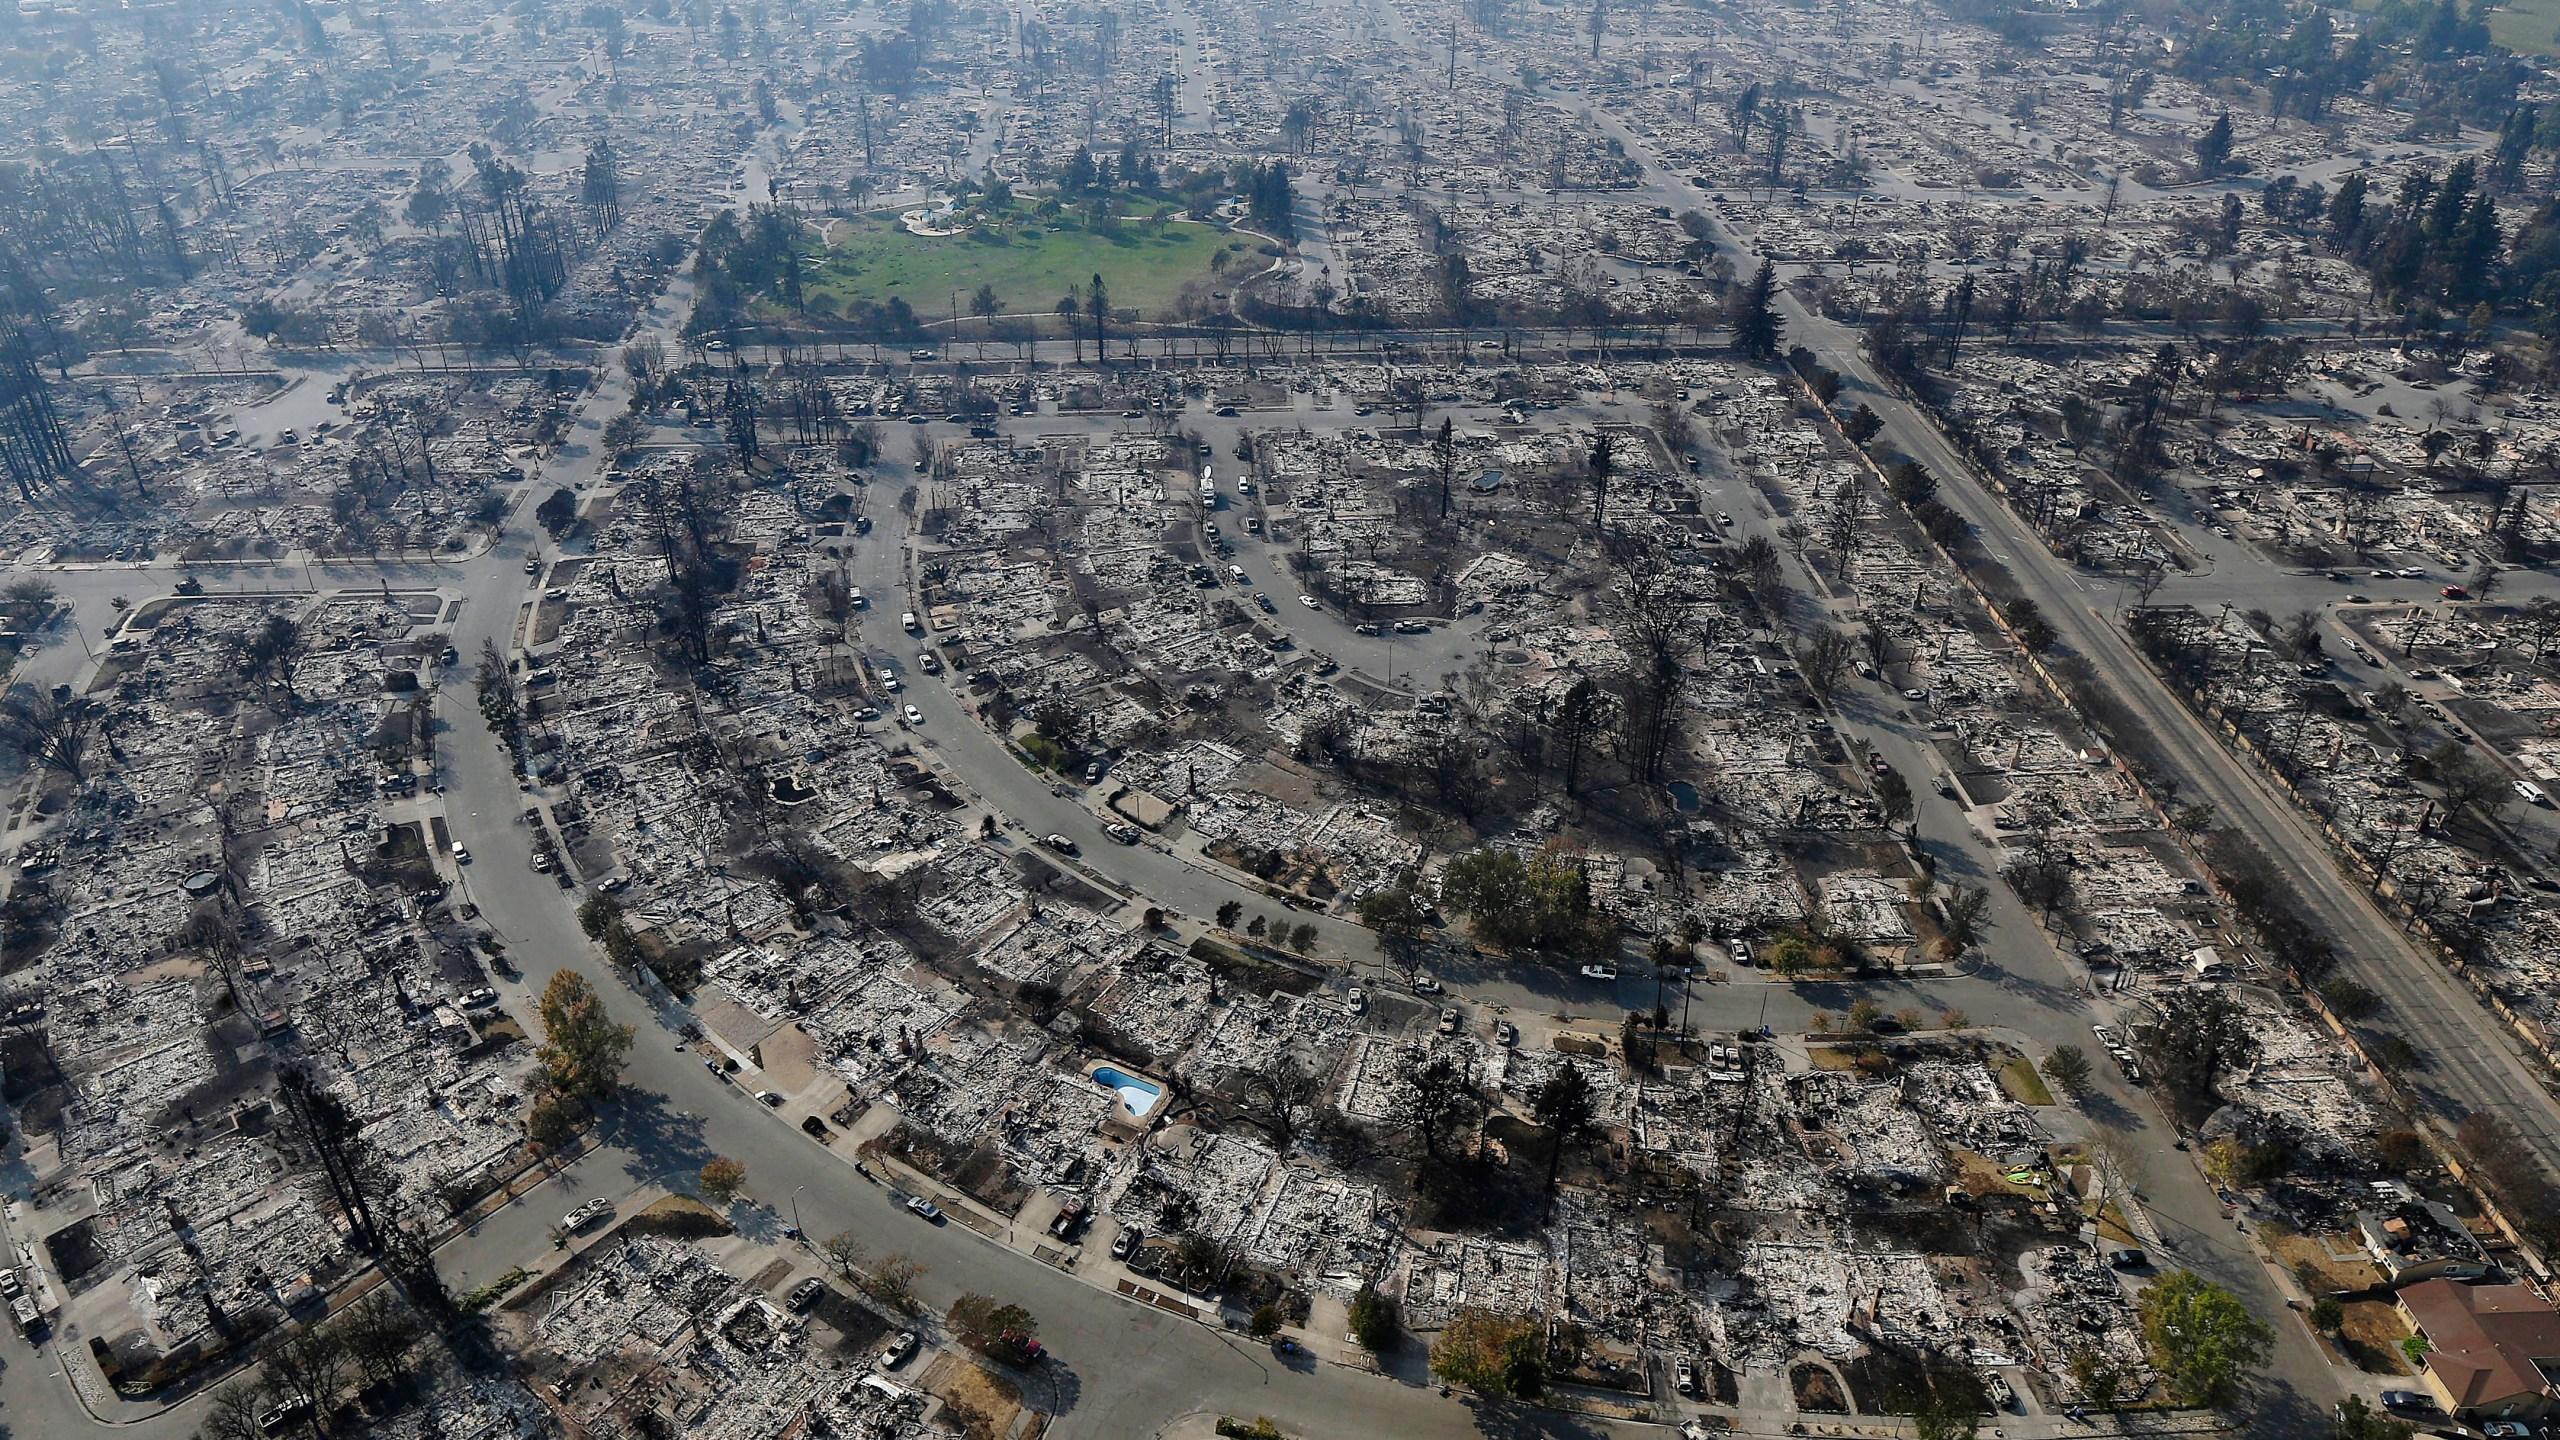 California_Wildfires_Cameras_21681-159532.jpg11030326